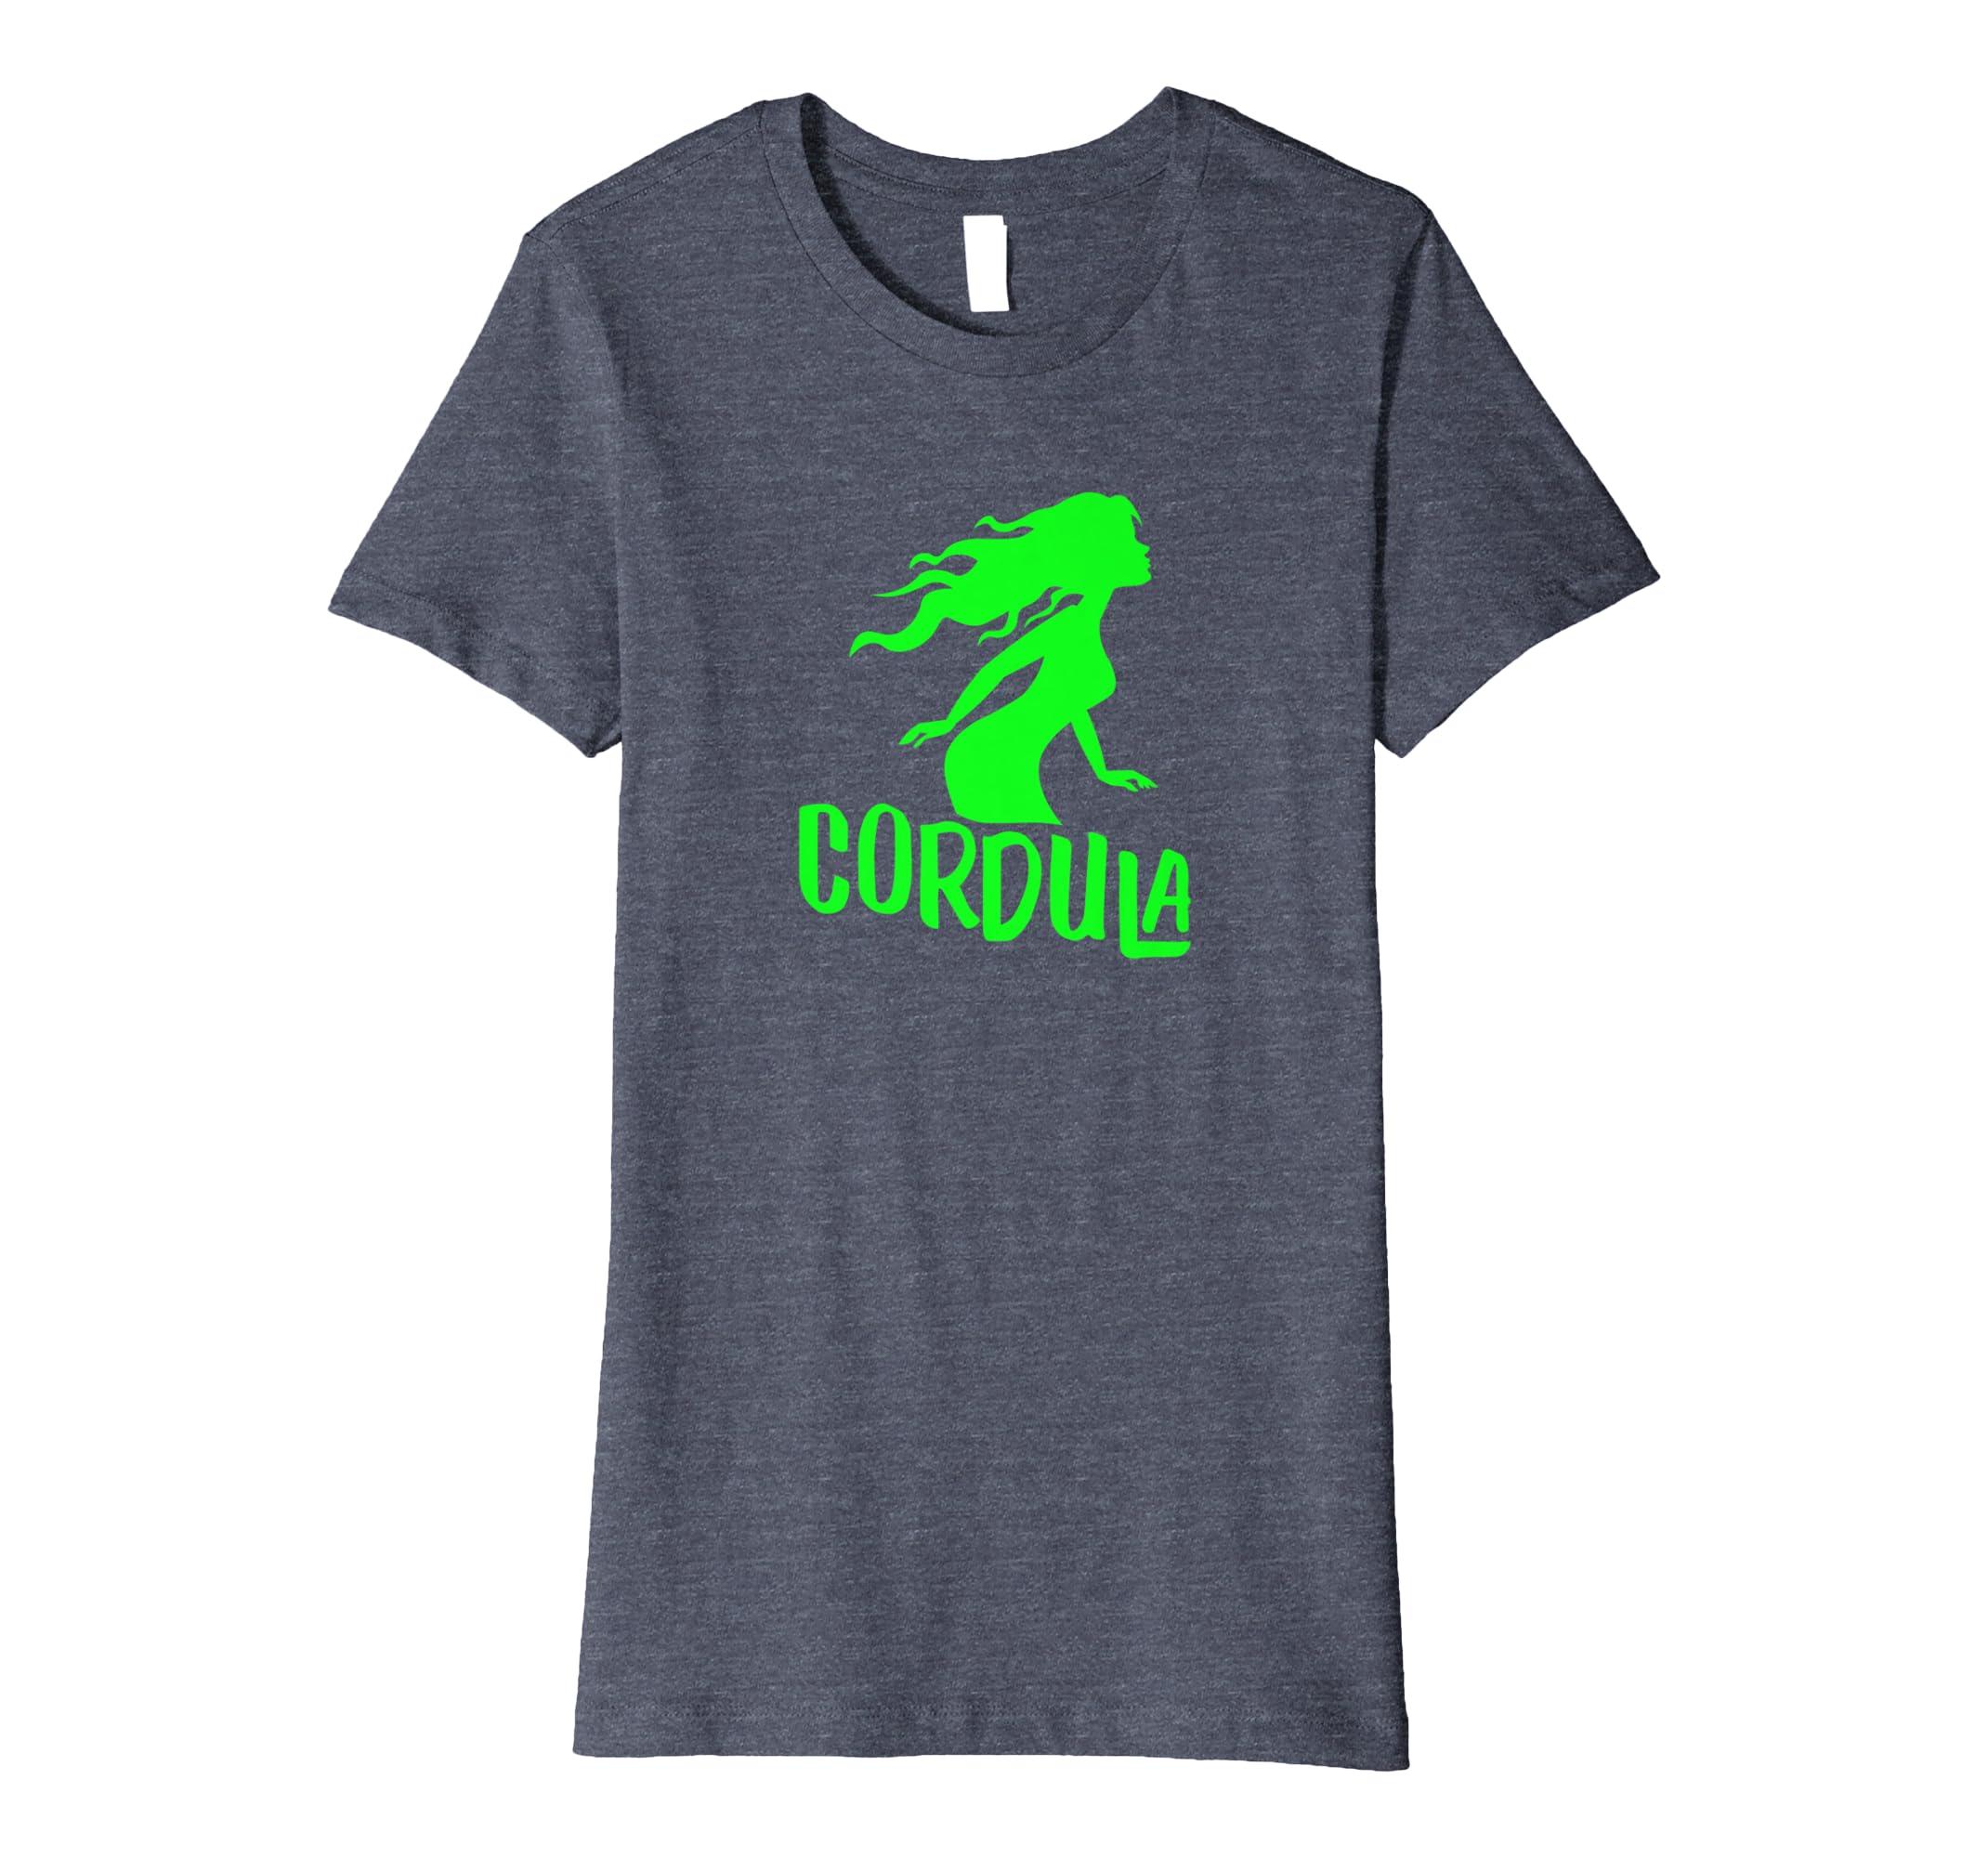 Cordula In Grun Amazon De Bekleidung